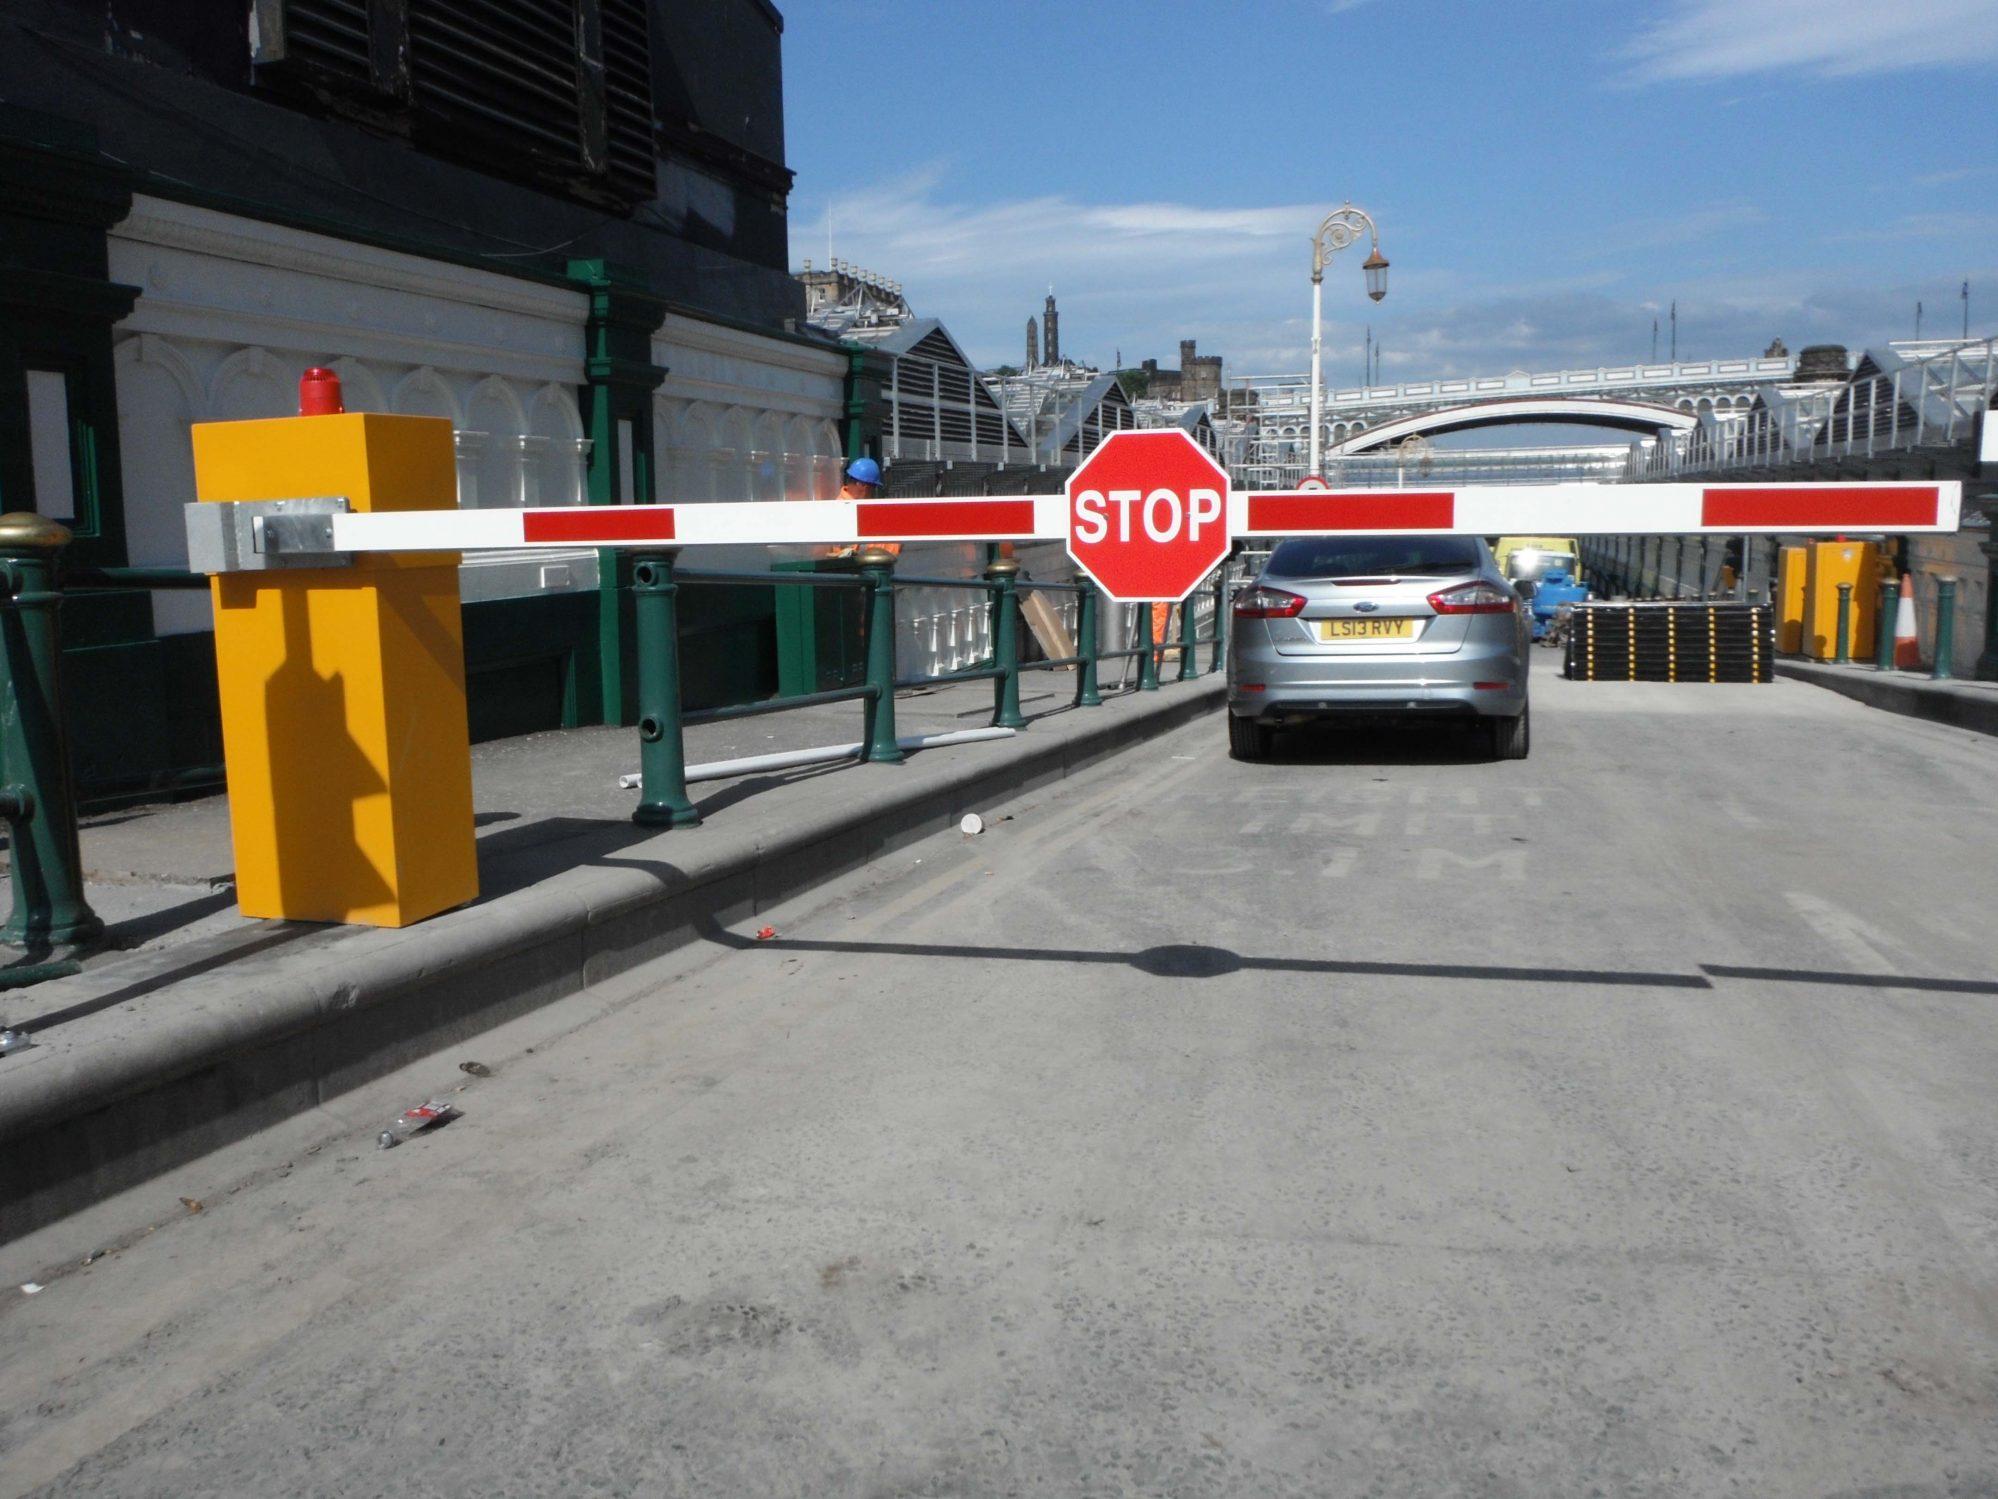 Traffic Management Amp Parking Vehicle Access Control